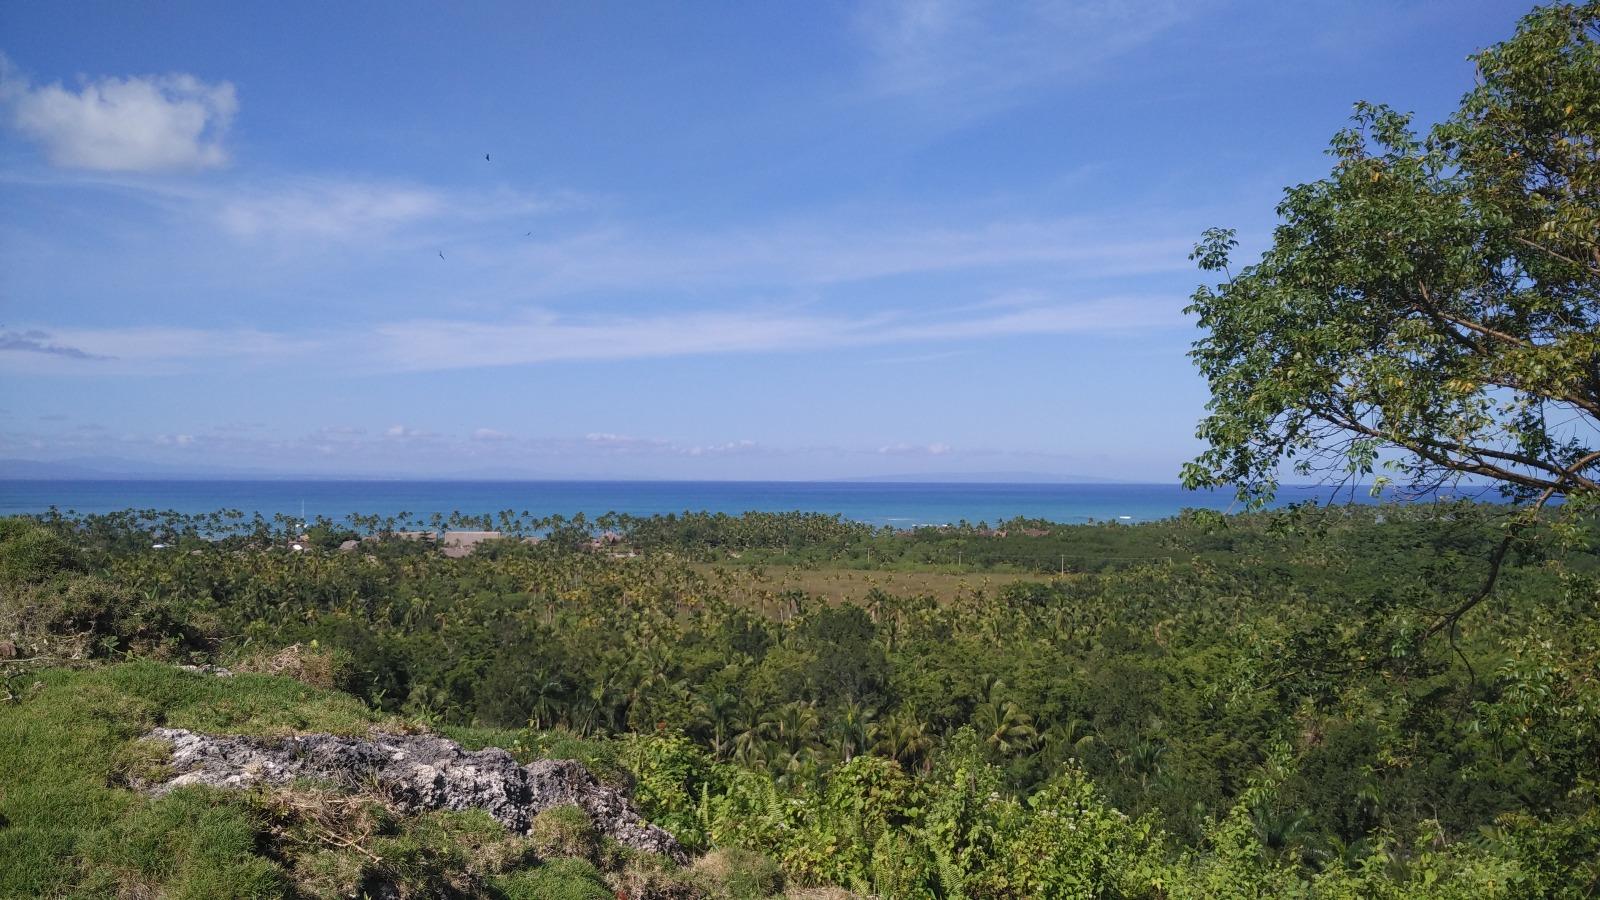 Hill for sale in Las Terrenas Dominican republic 13.jpeg